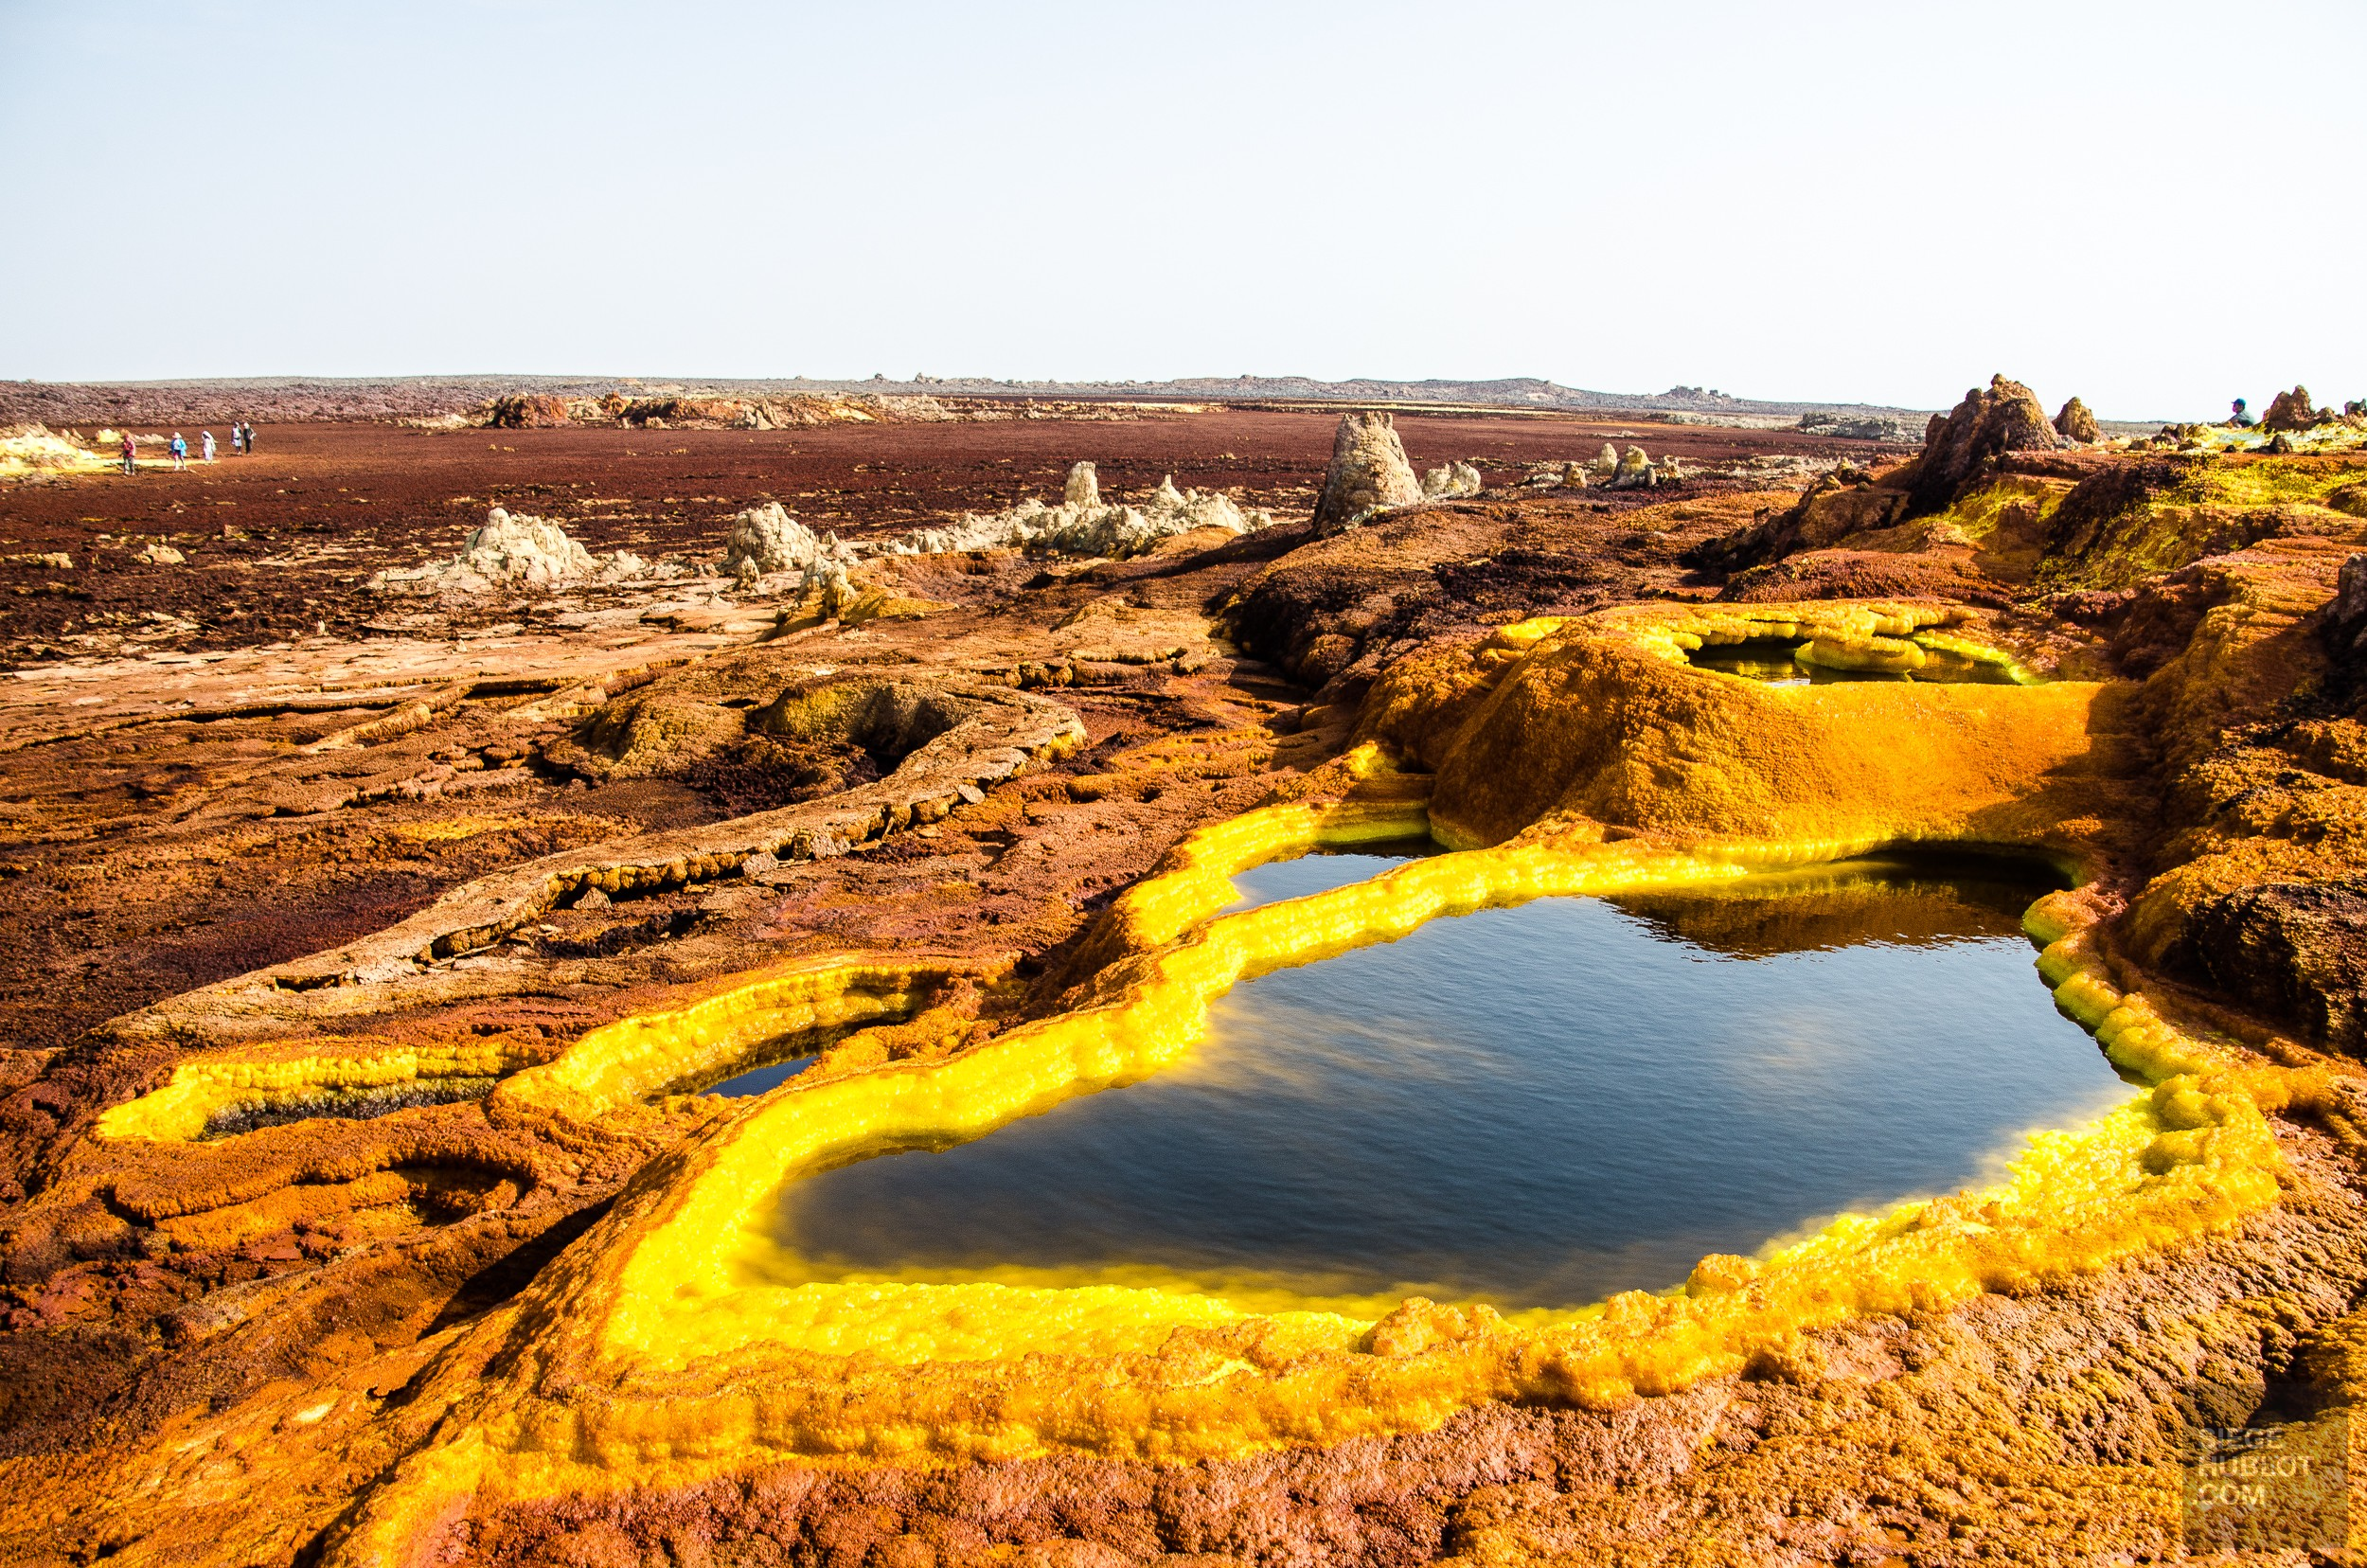 etang acide sulfurique - Dallol - Visiter une autre planete: Danakil, Ethiopie - afrique, ethiopie